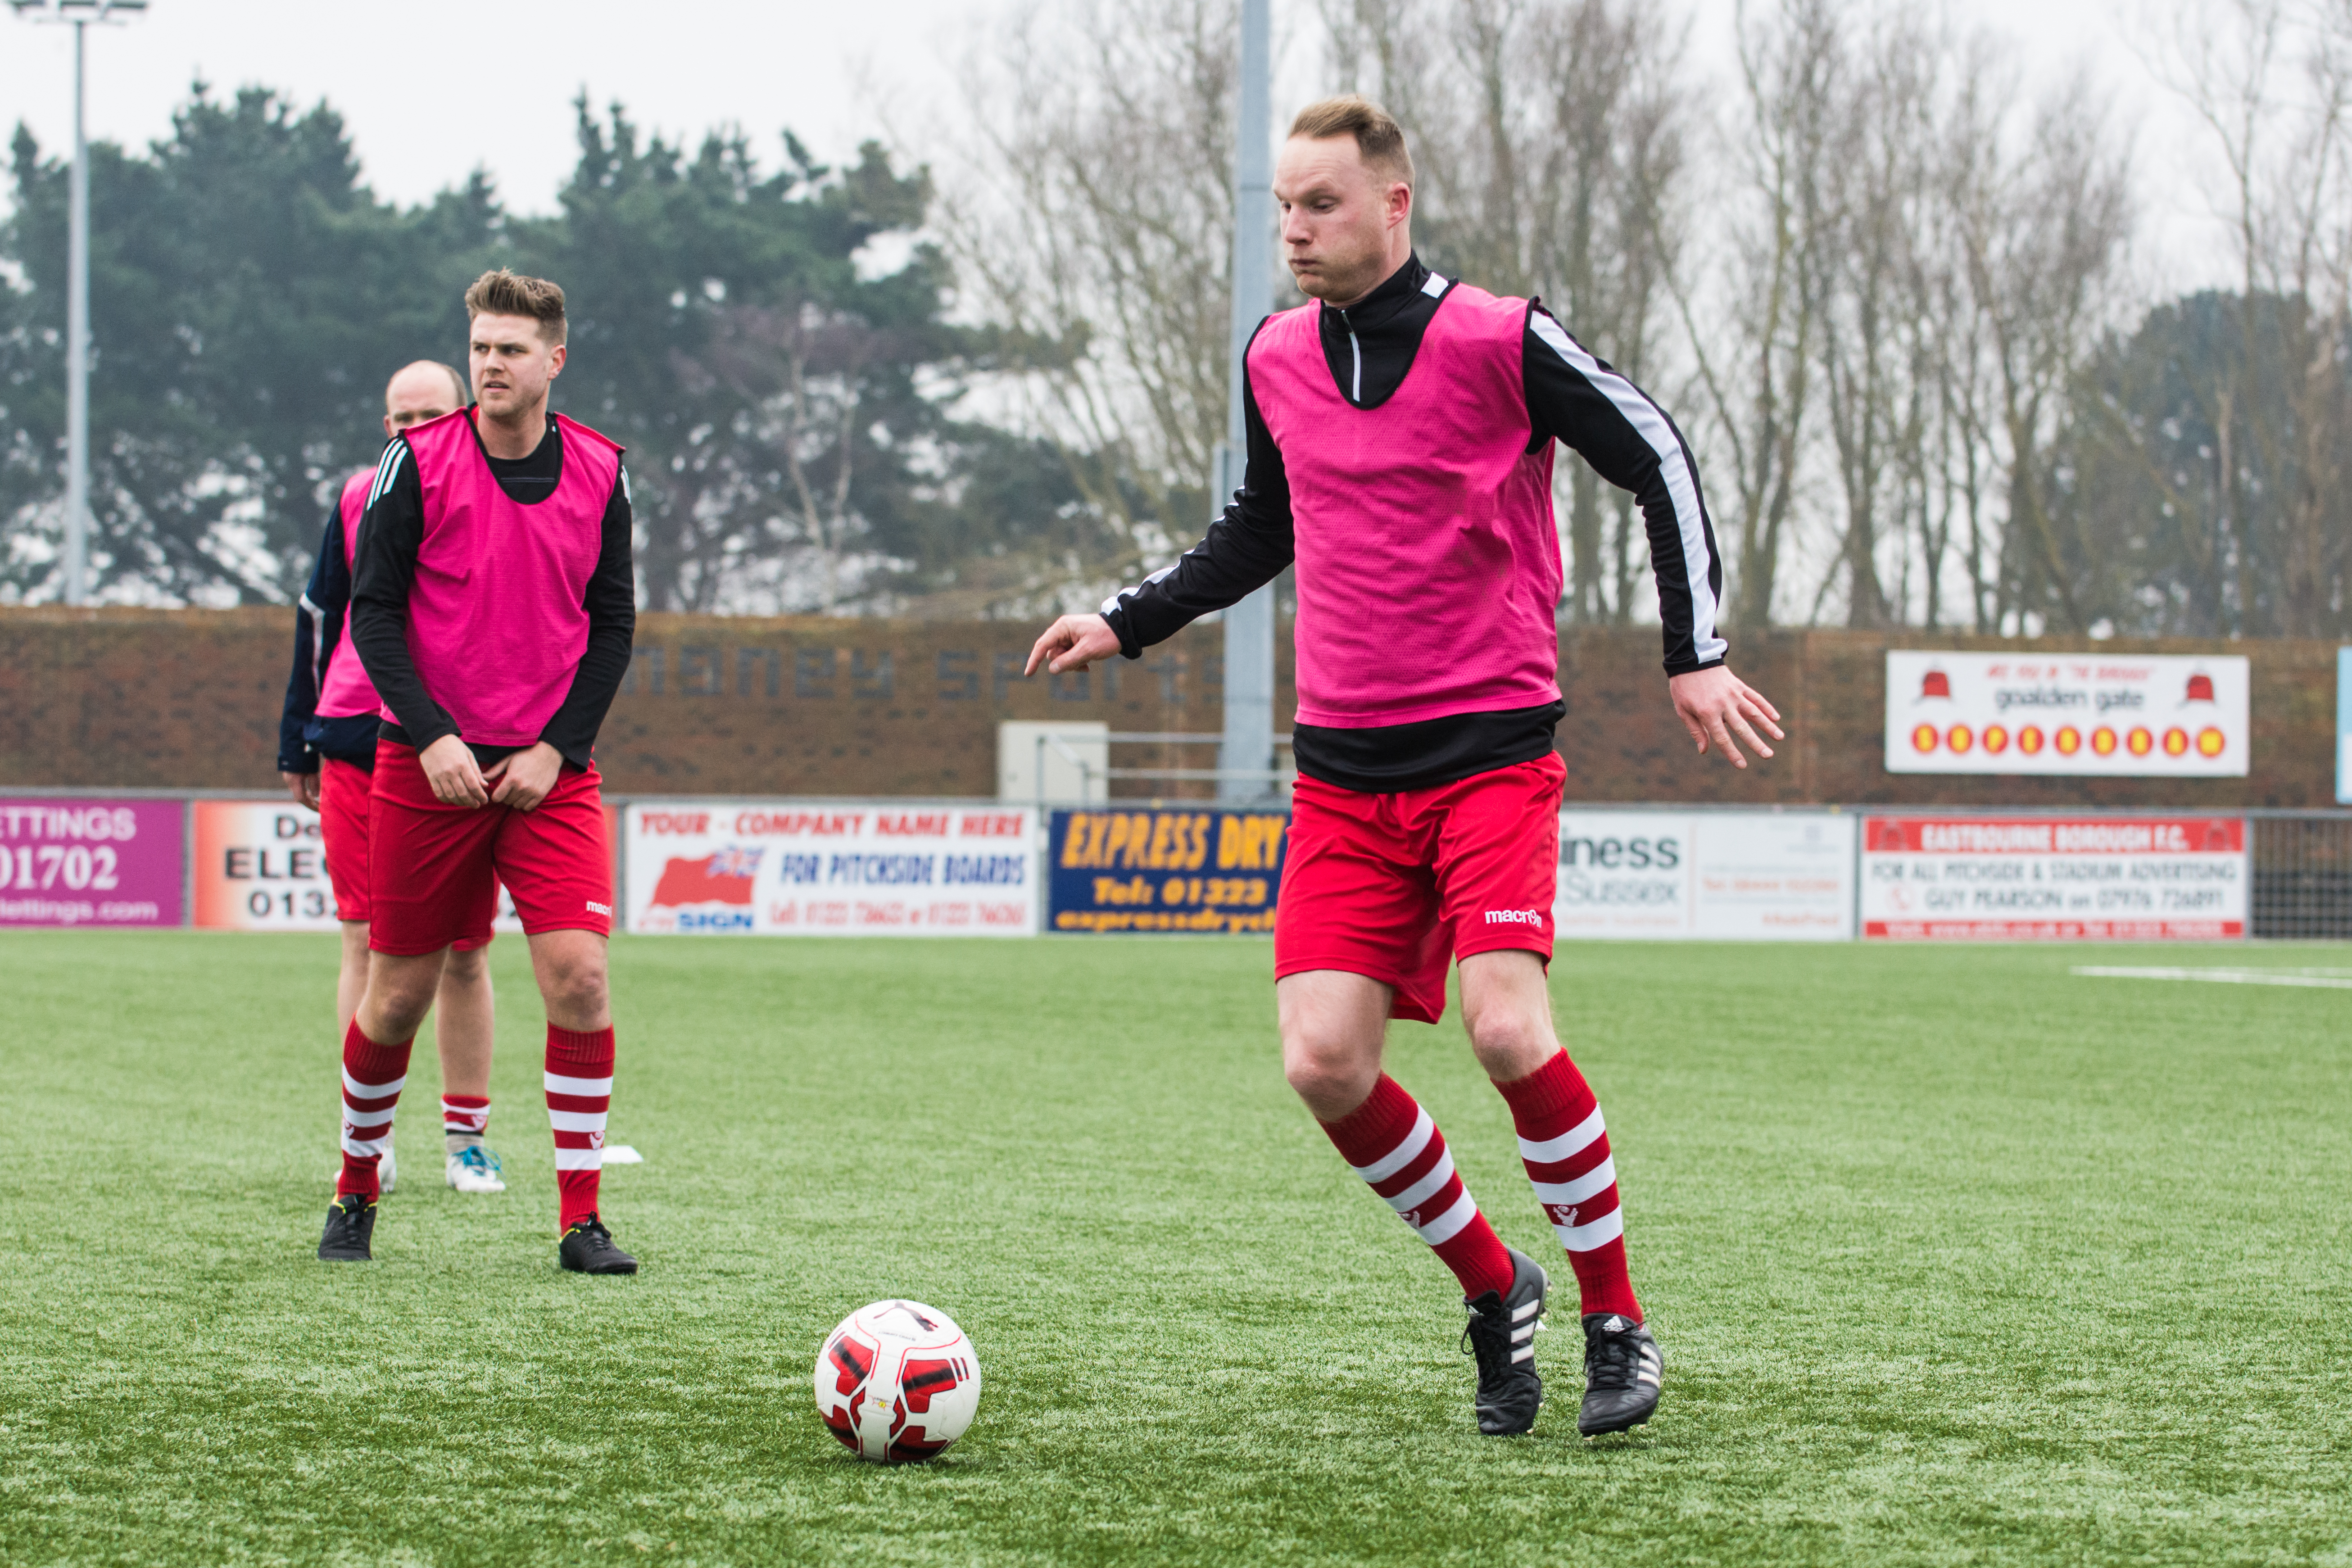 DAVID_JEFFERY Langney Wanderers FC vs Bexhill United FC 03.03.18 17